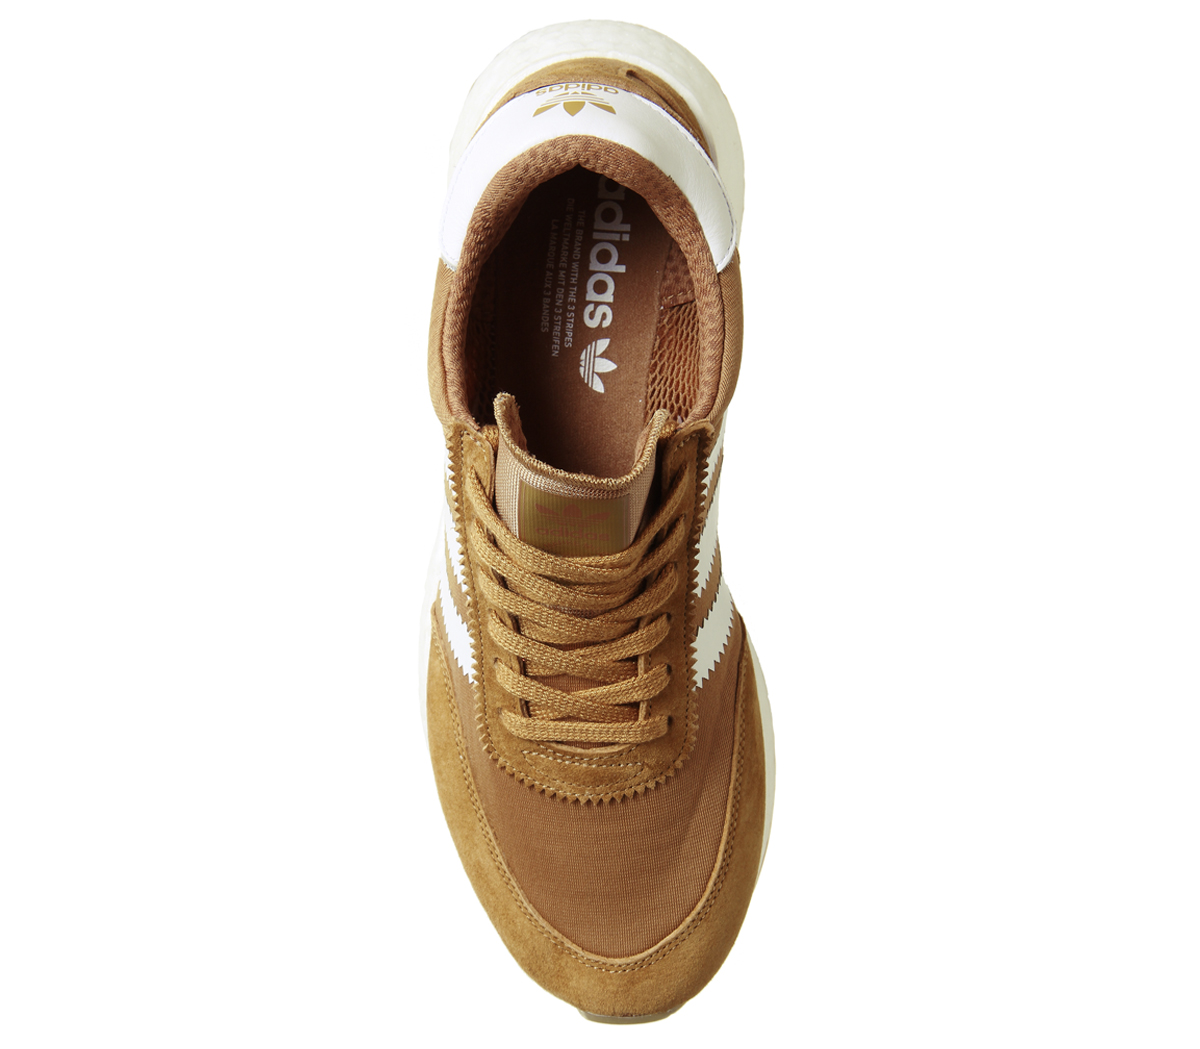 pretty nice 2702c 1aa41 Adidas-I-5923-Pour-Homme-Baskets-MESA-White-